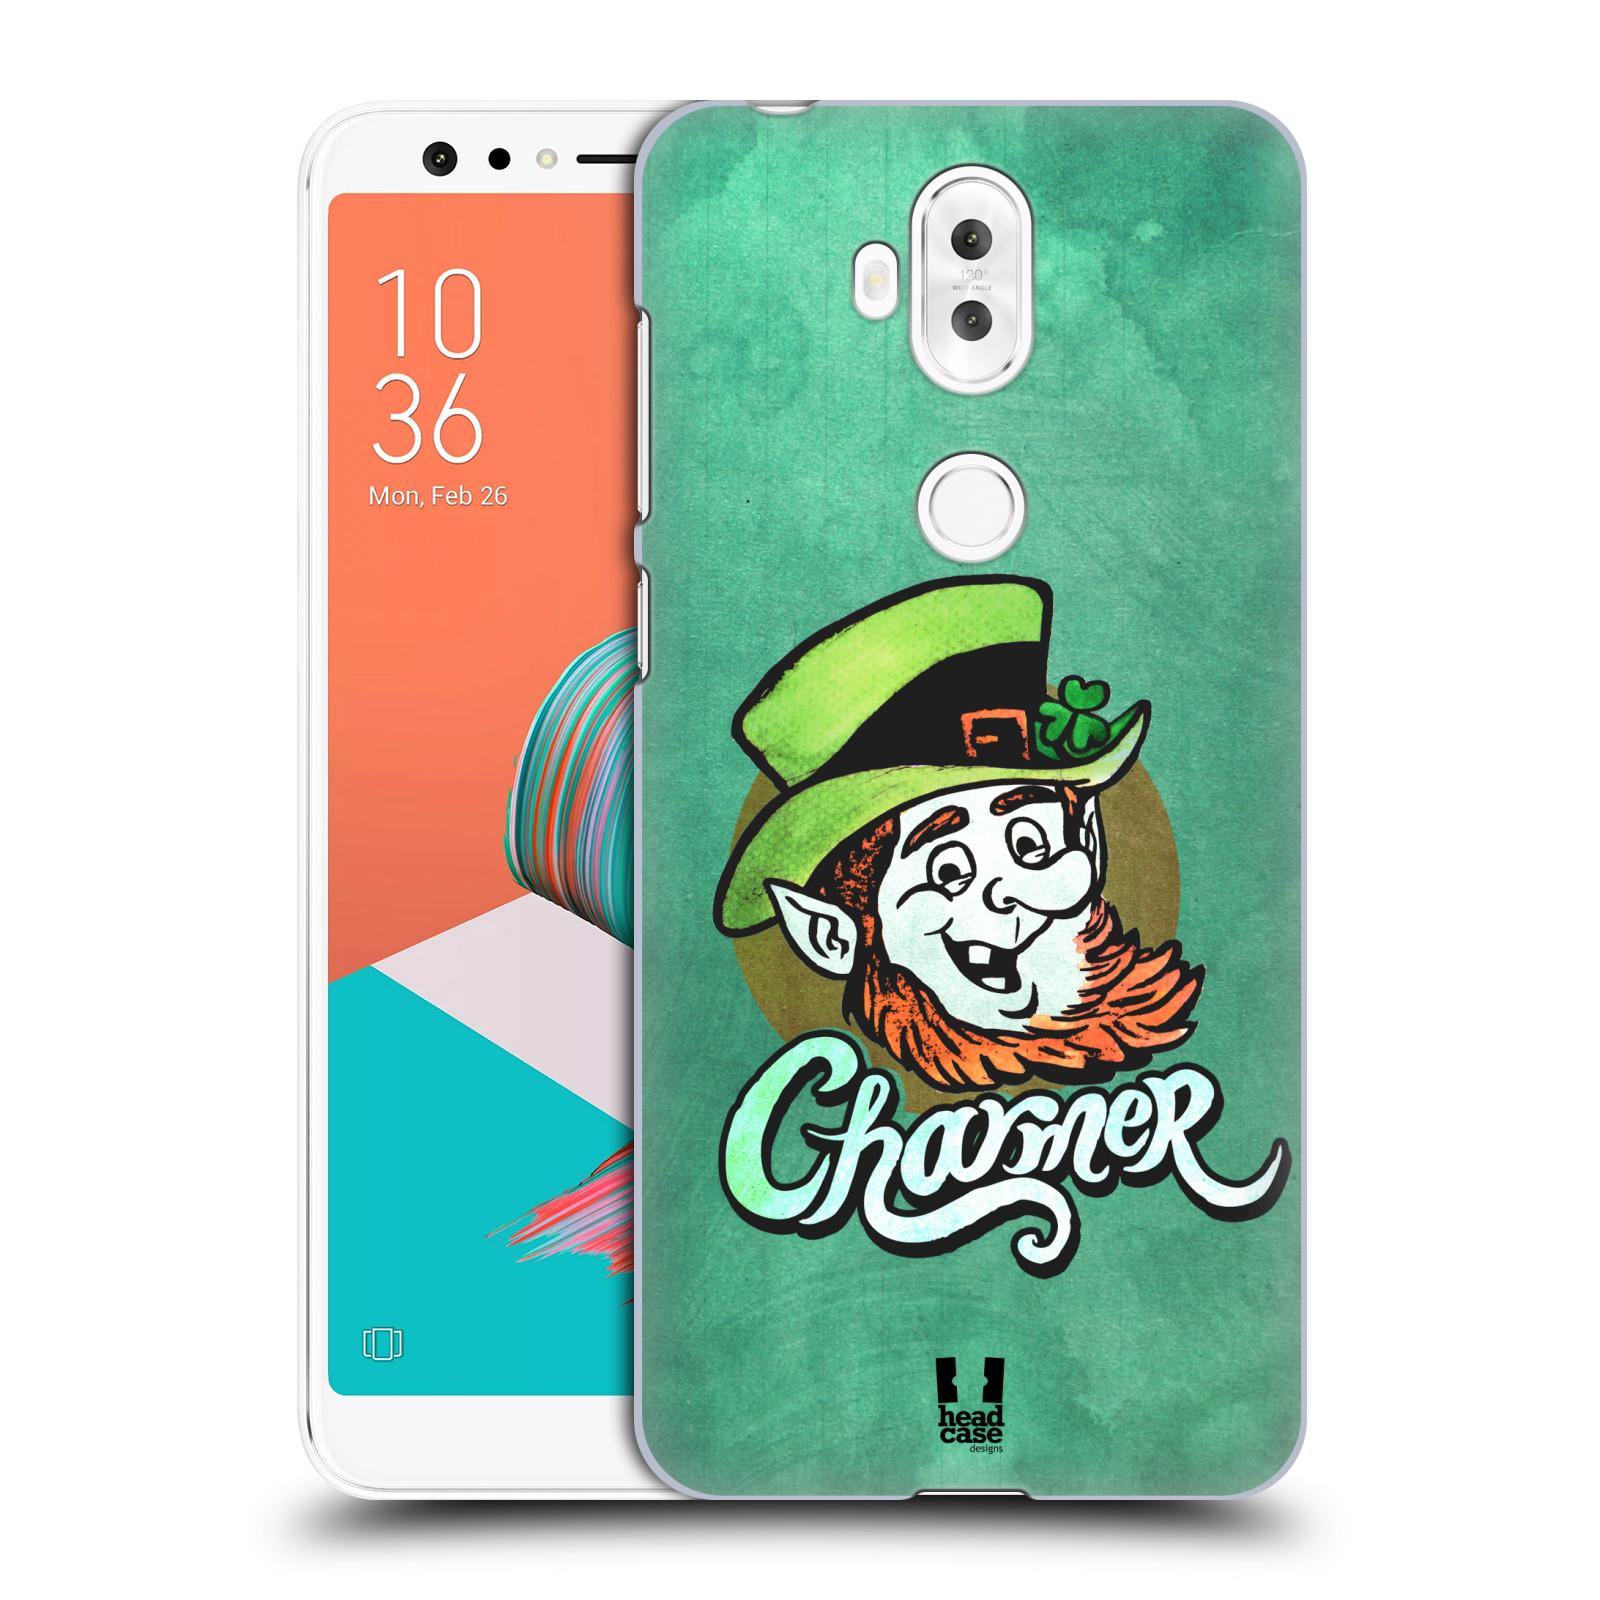 Plastové pouzdro na mobil Asus ZenFone 5 Lite ZC600KL - Head Case - CHARMER (Plastový kryt či obal na mobilní telefon Asus ZenFone 5 Lite (ZC600KL) s motivem CHARMER)